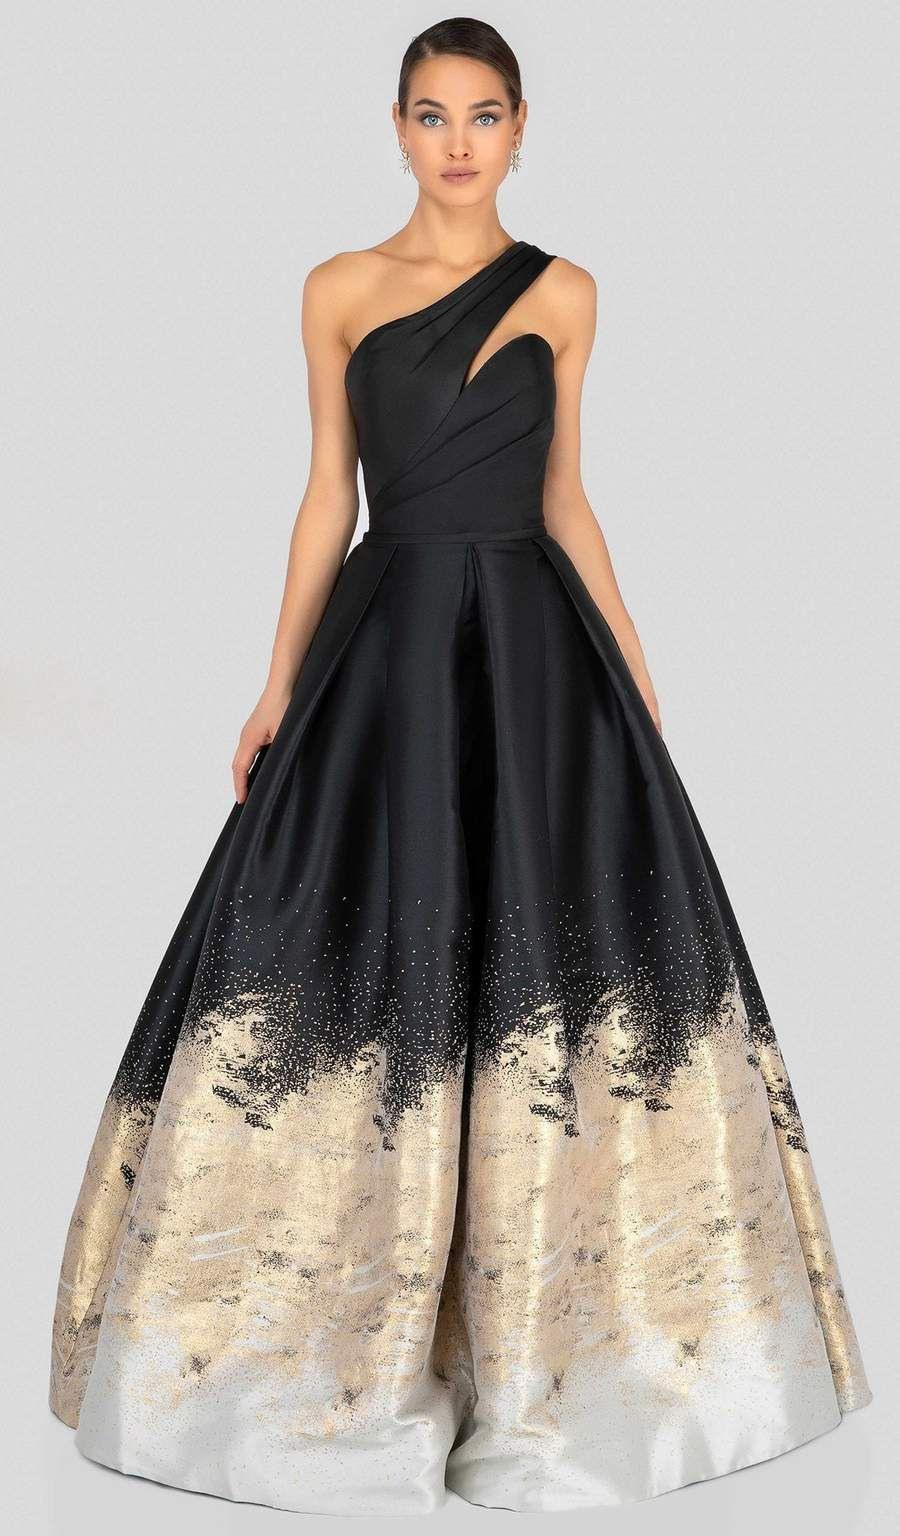 10 Leicht Terani Couture Abendkleid Boutique17 Einzigartig Terani Couture Abendkleid Vertrieb